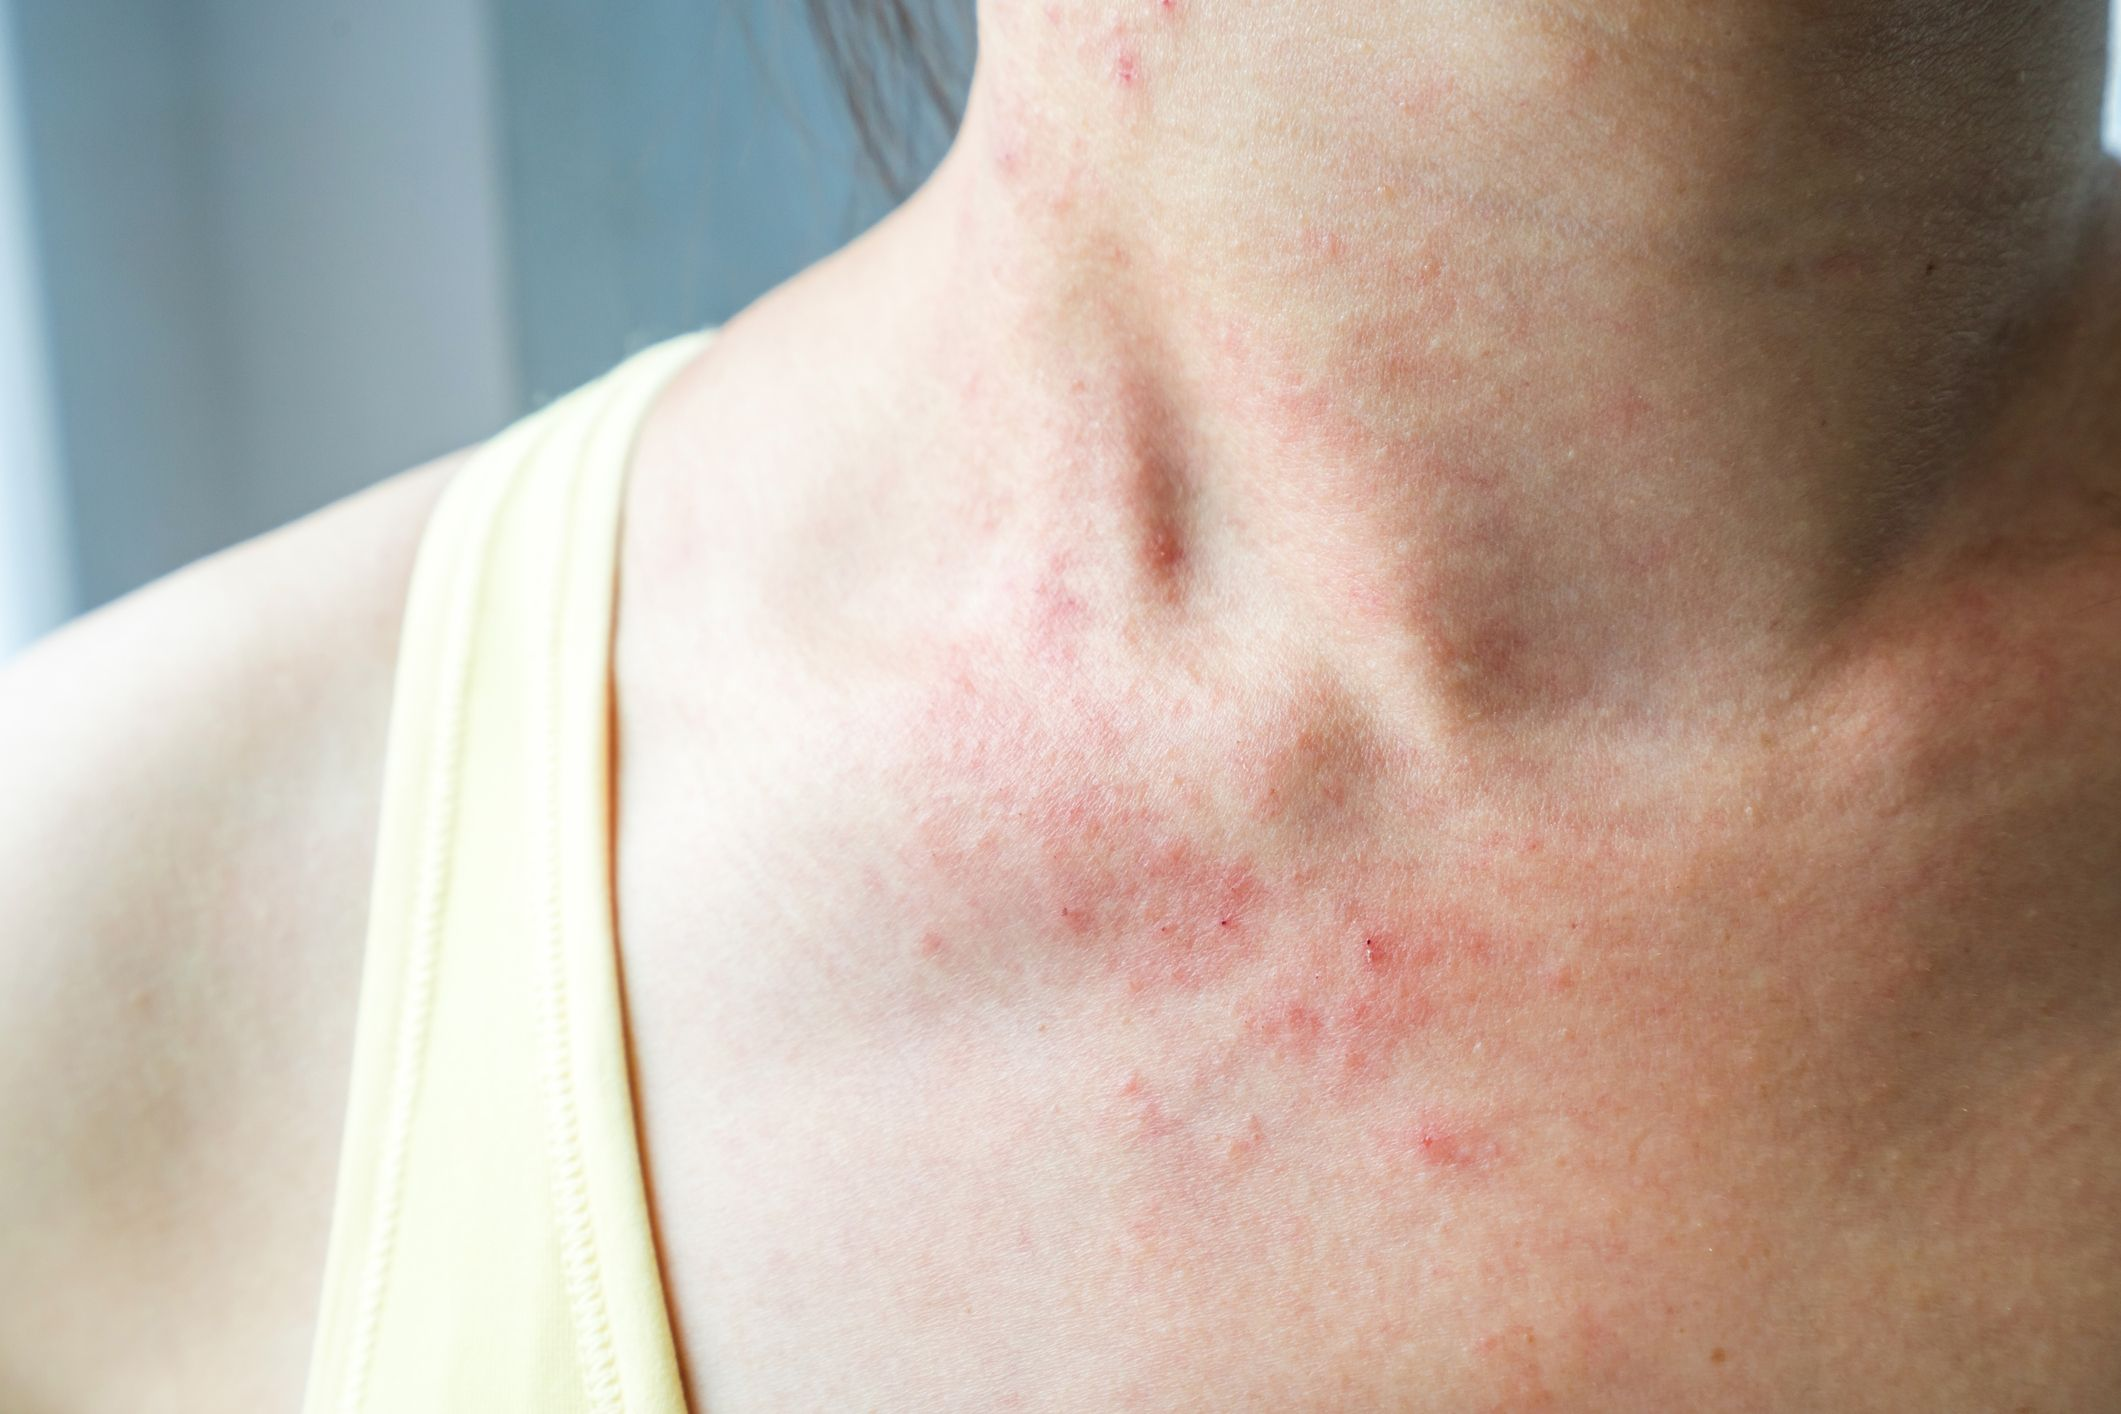 rash back of neck